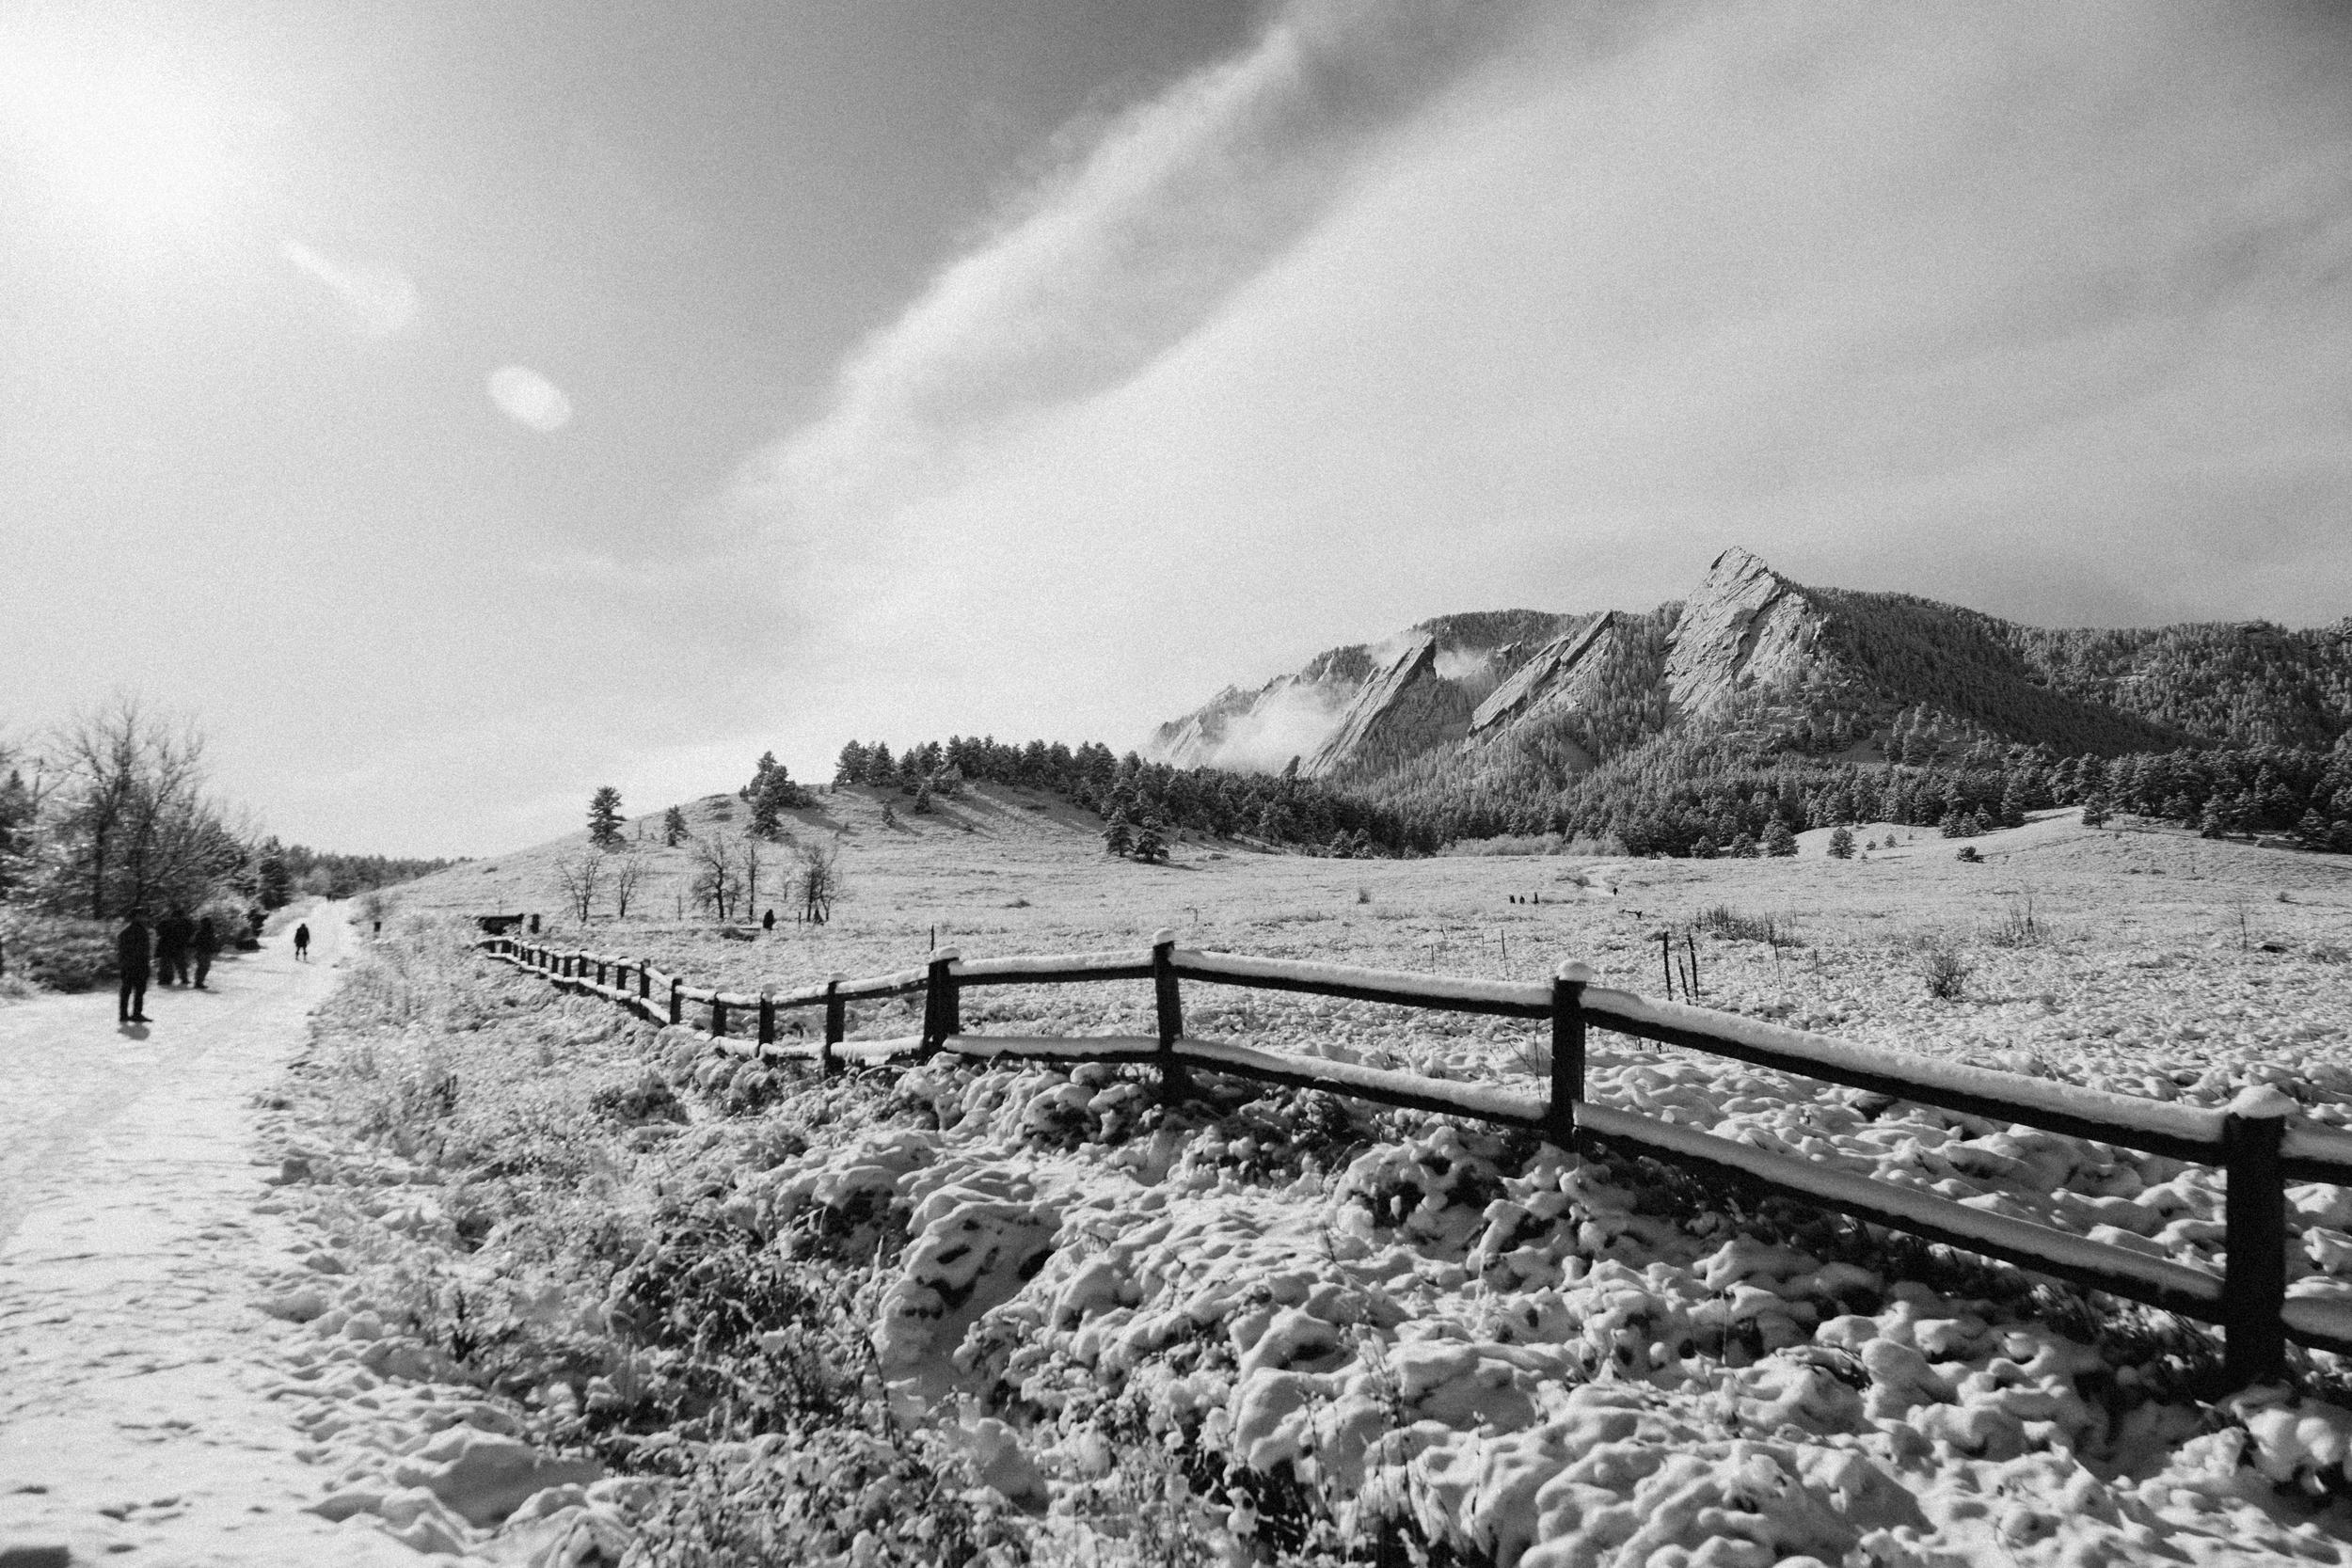 Flatirons Snow 2015-11-30 (7).jpg